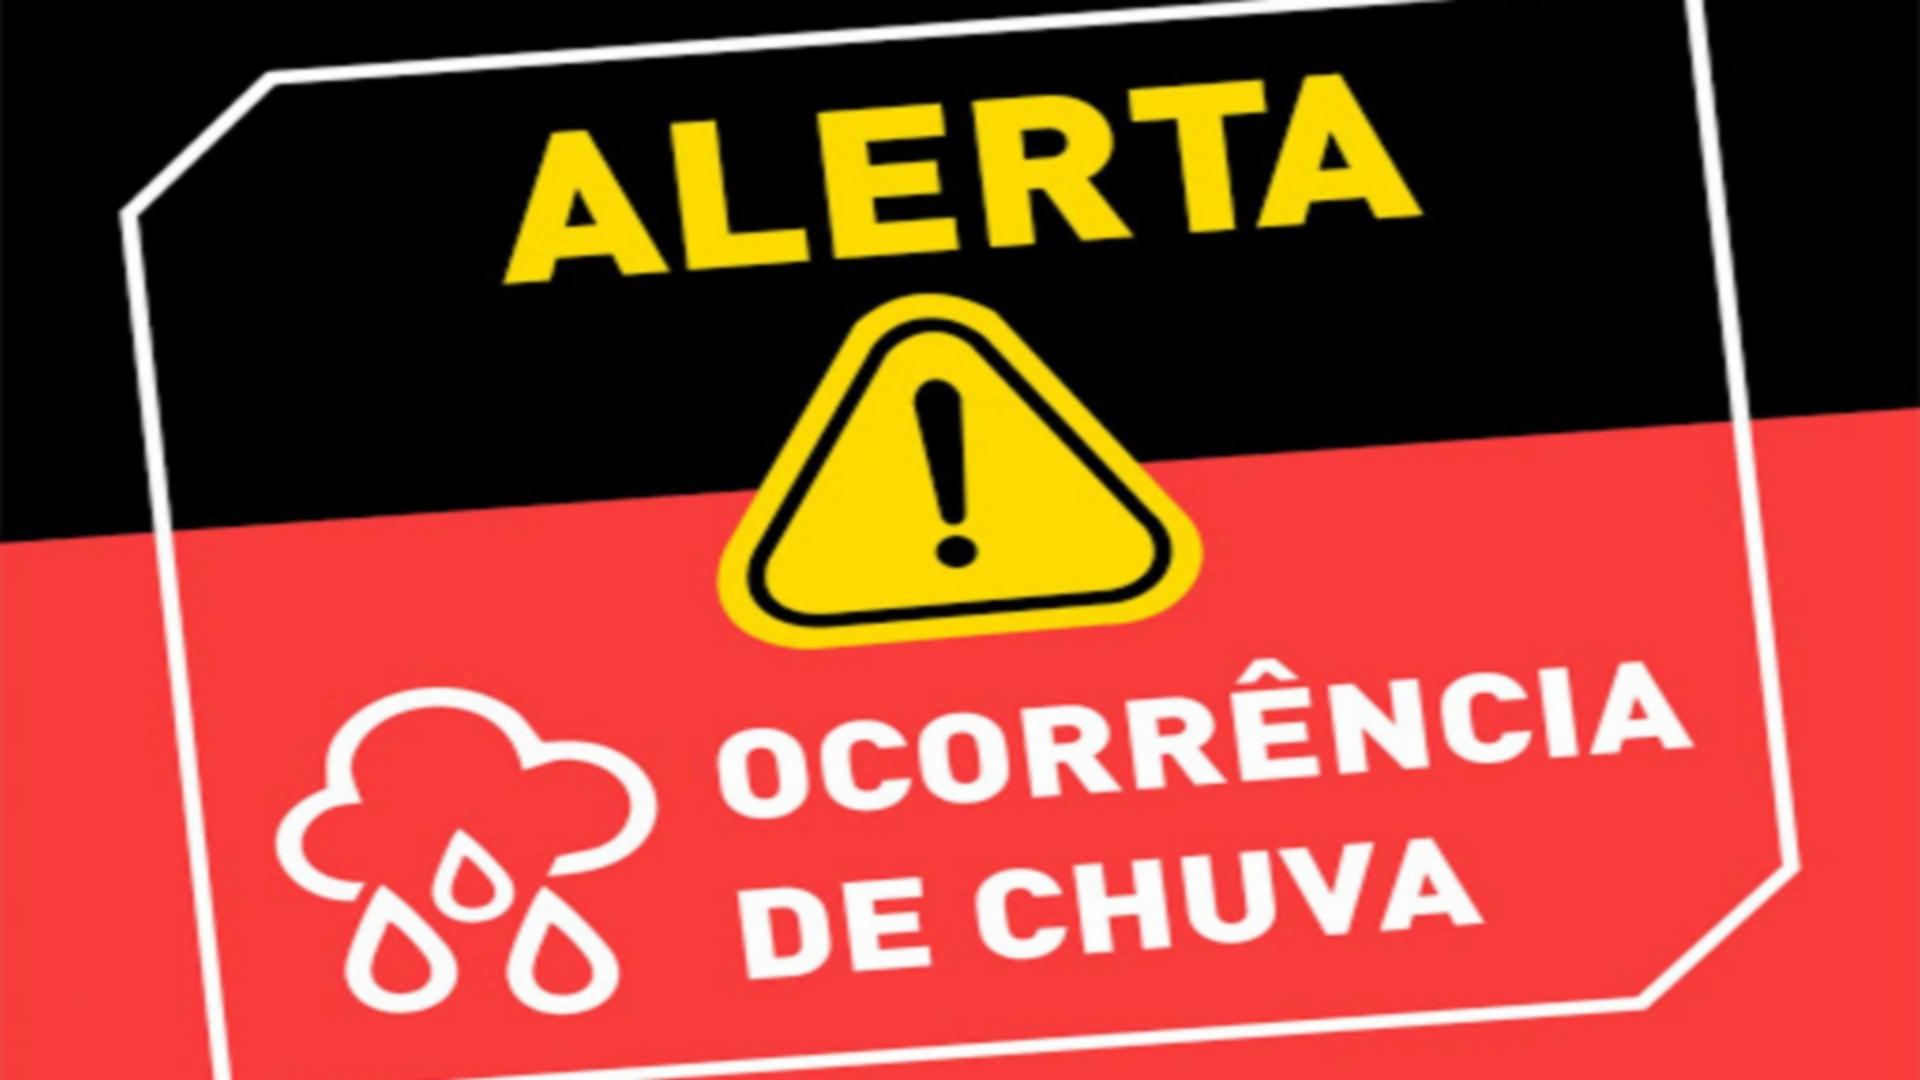 CUIDADO … ALERTAMOS PARA OS PERIGOS DAS CHUVAS !!!